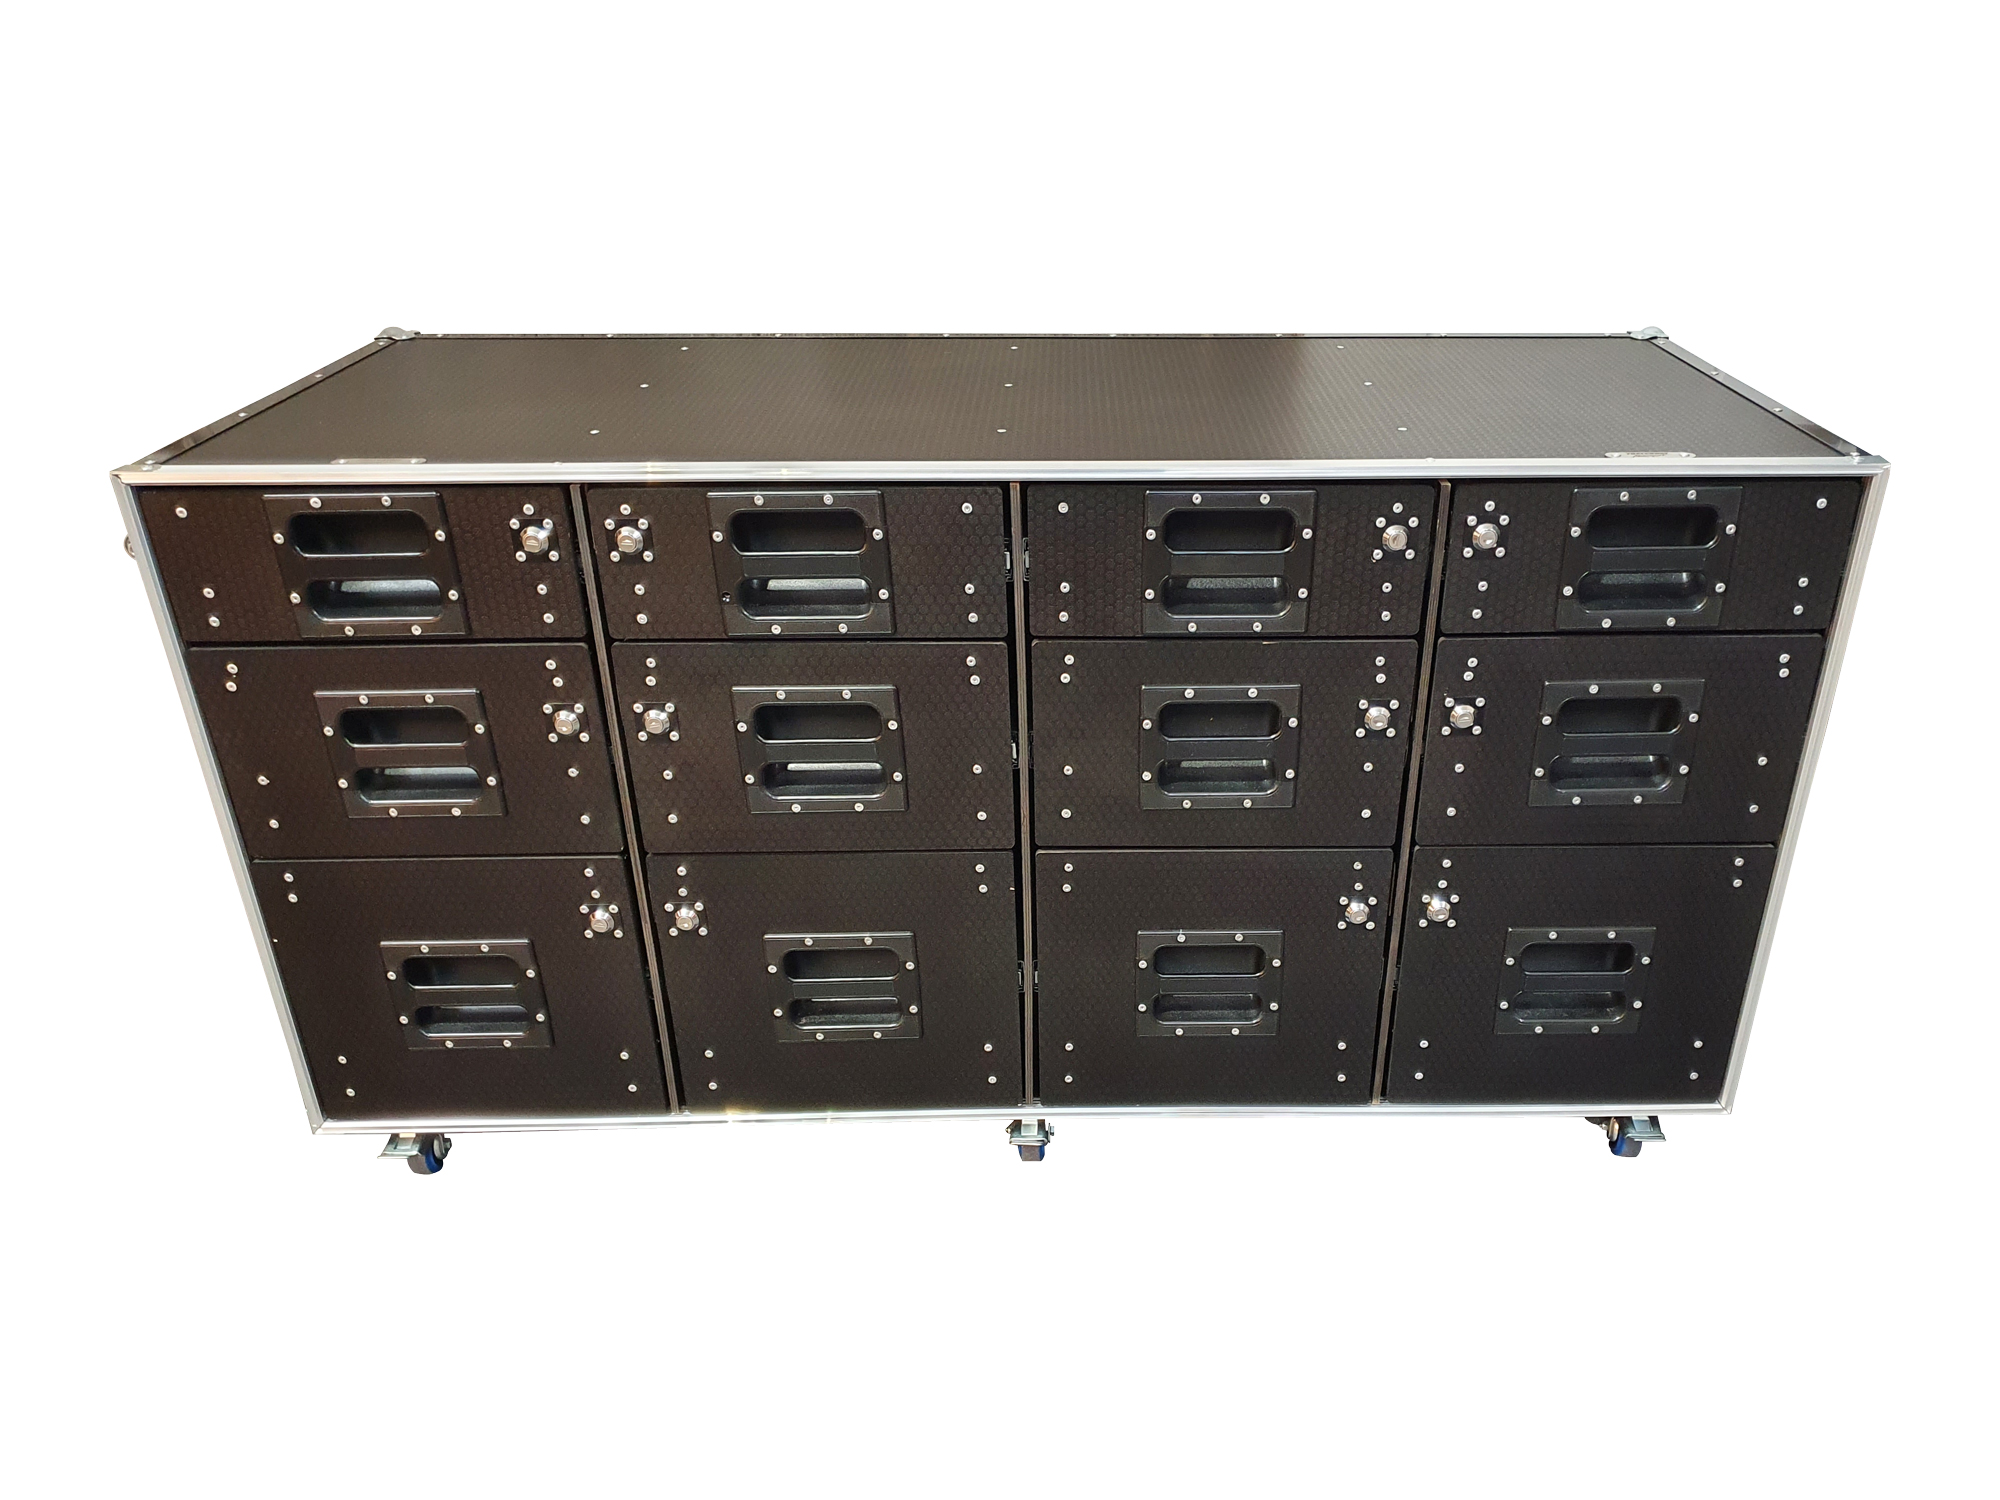 Lockable roll cabinet flight case